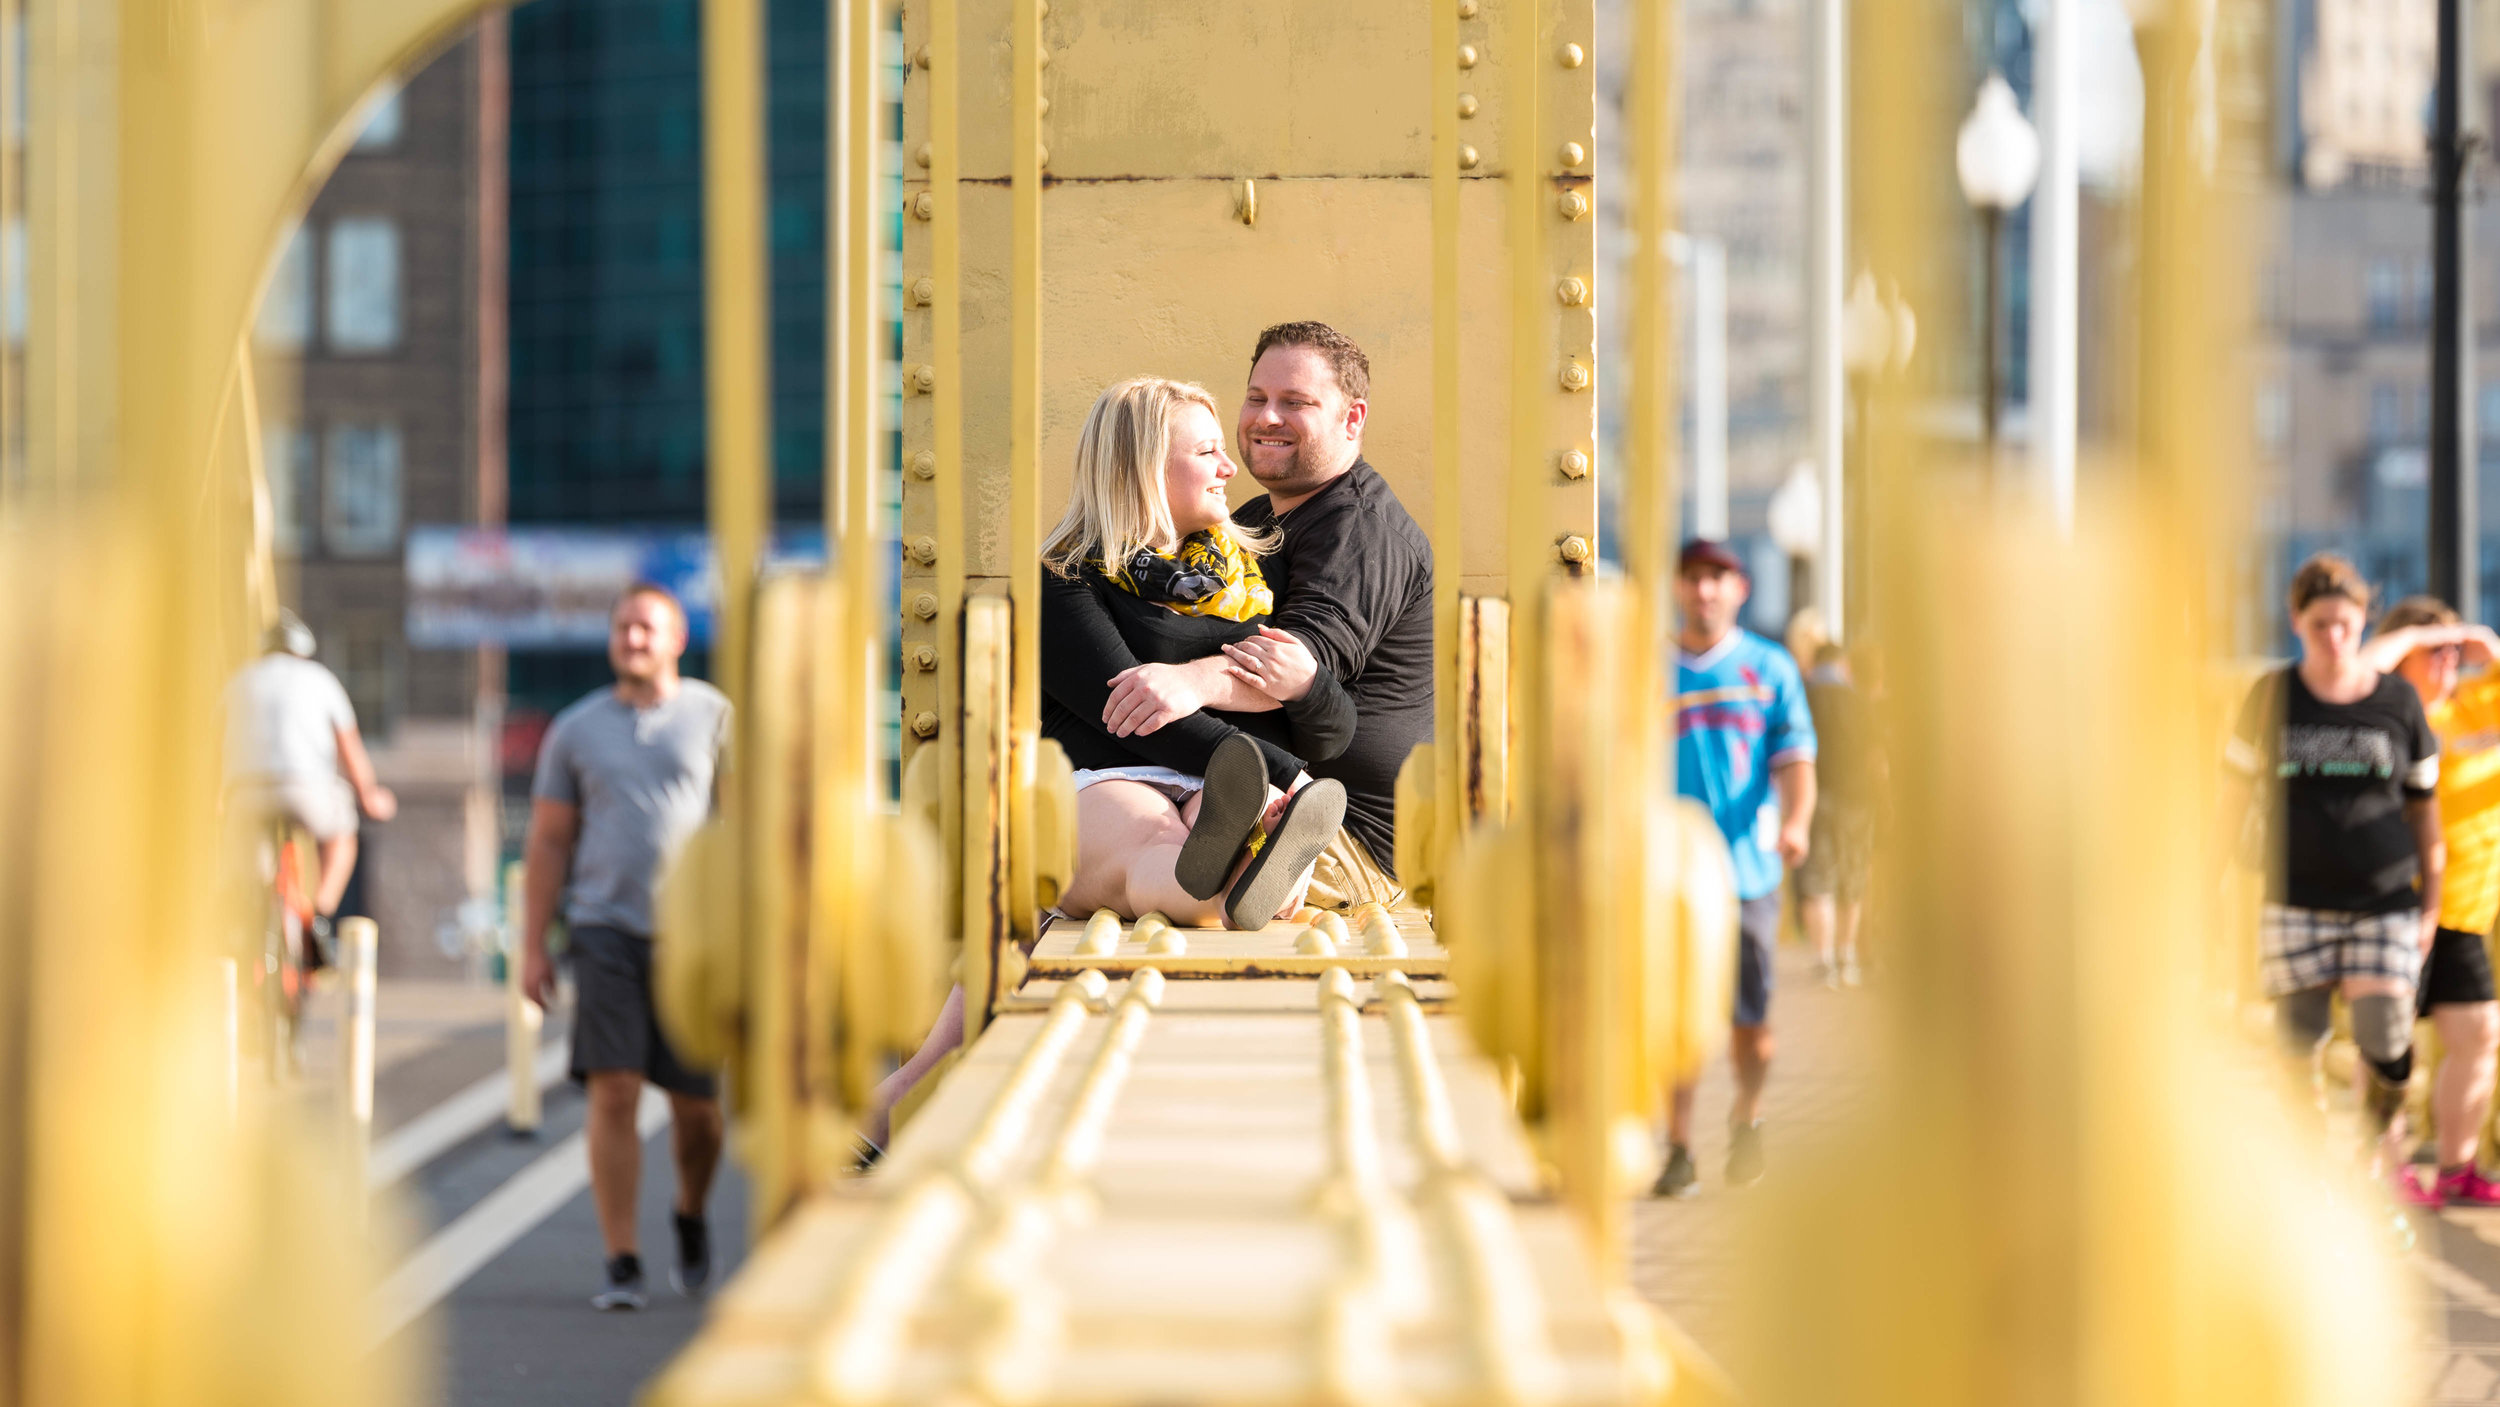 Pittsburgh-Northshore-Wedding-Engagement-Photography-16x9-2.jpg